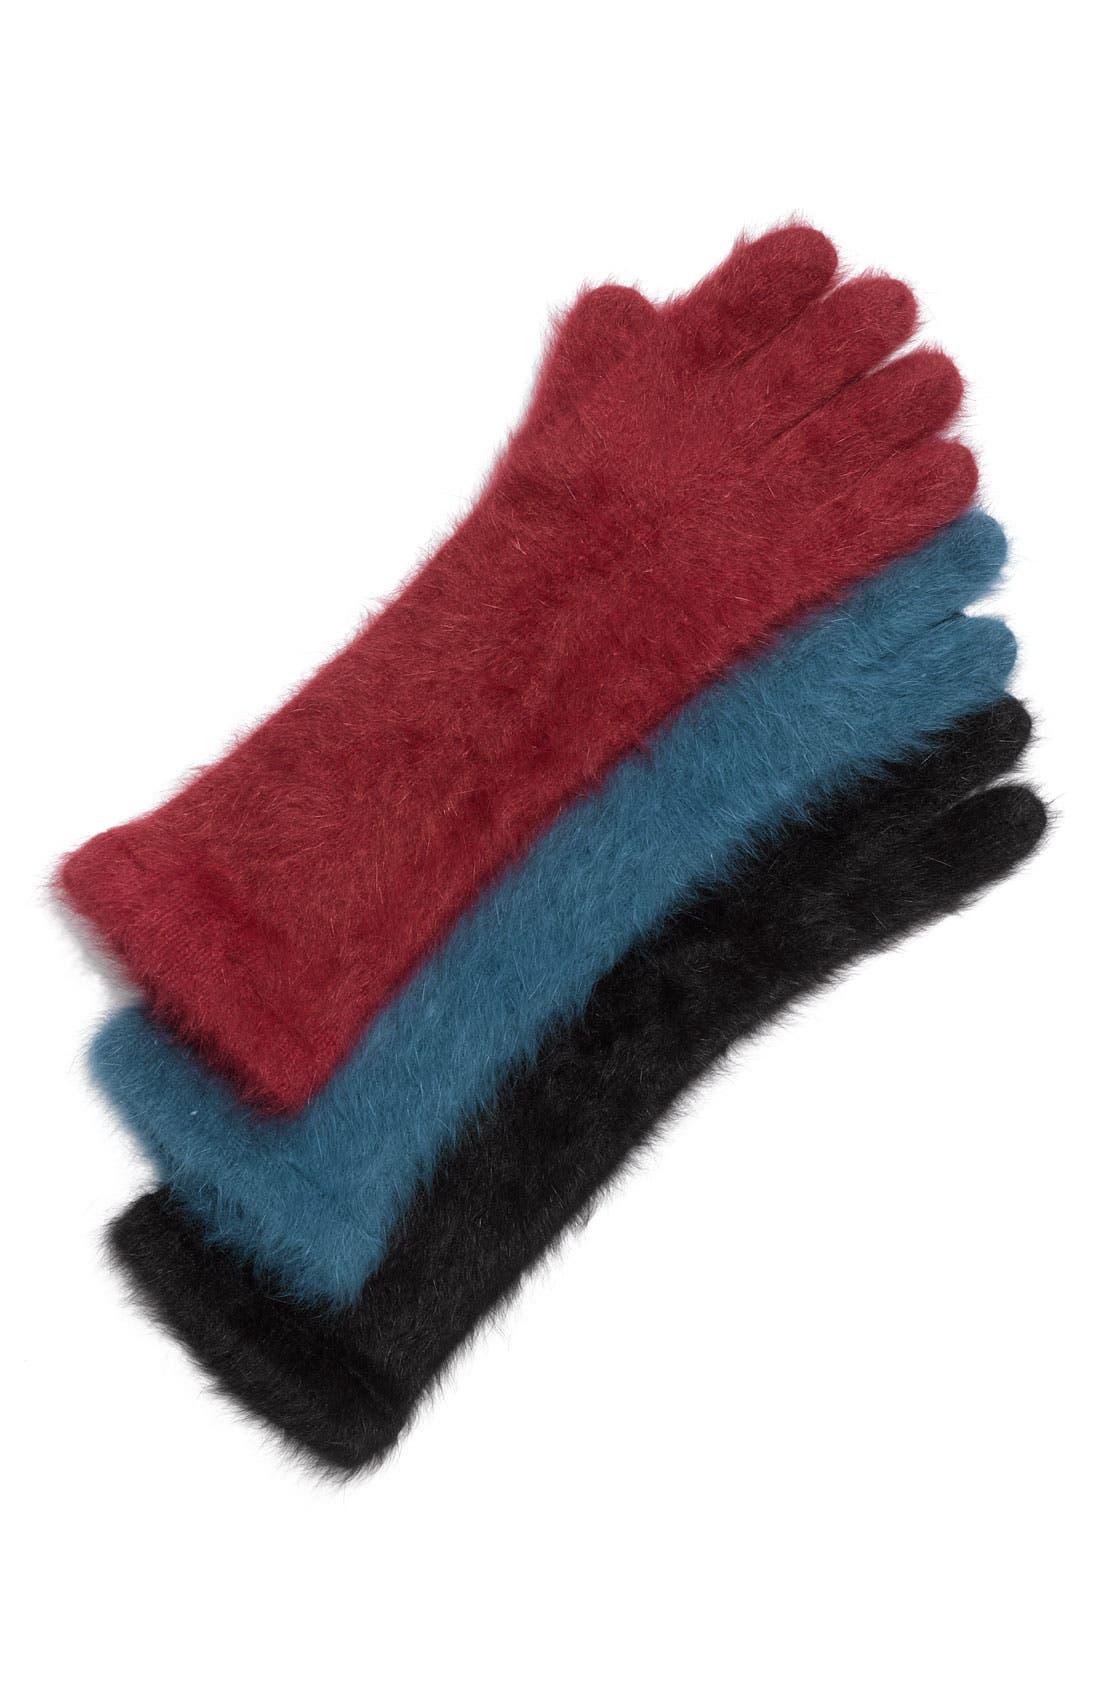 Alternate Image 1 Selected - Nordstrom Angora Blend Gloves